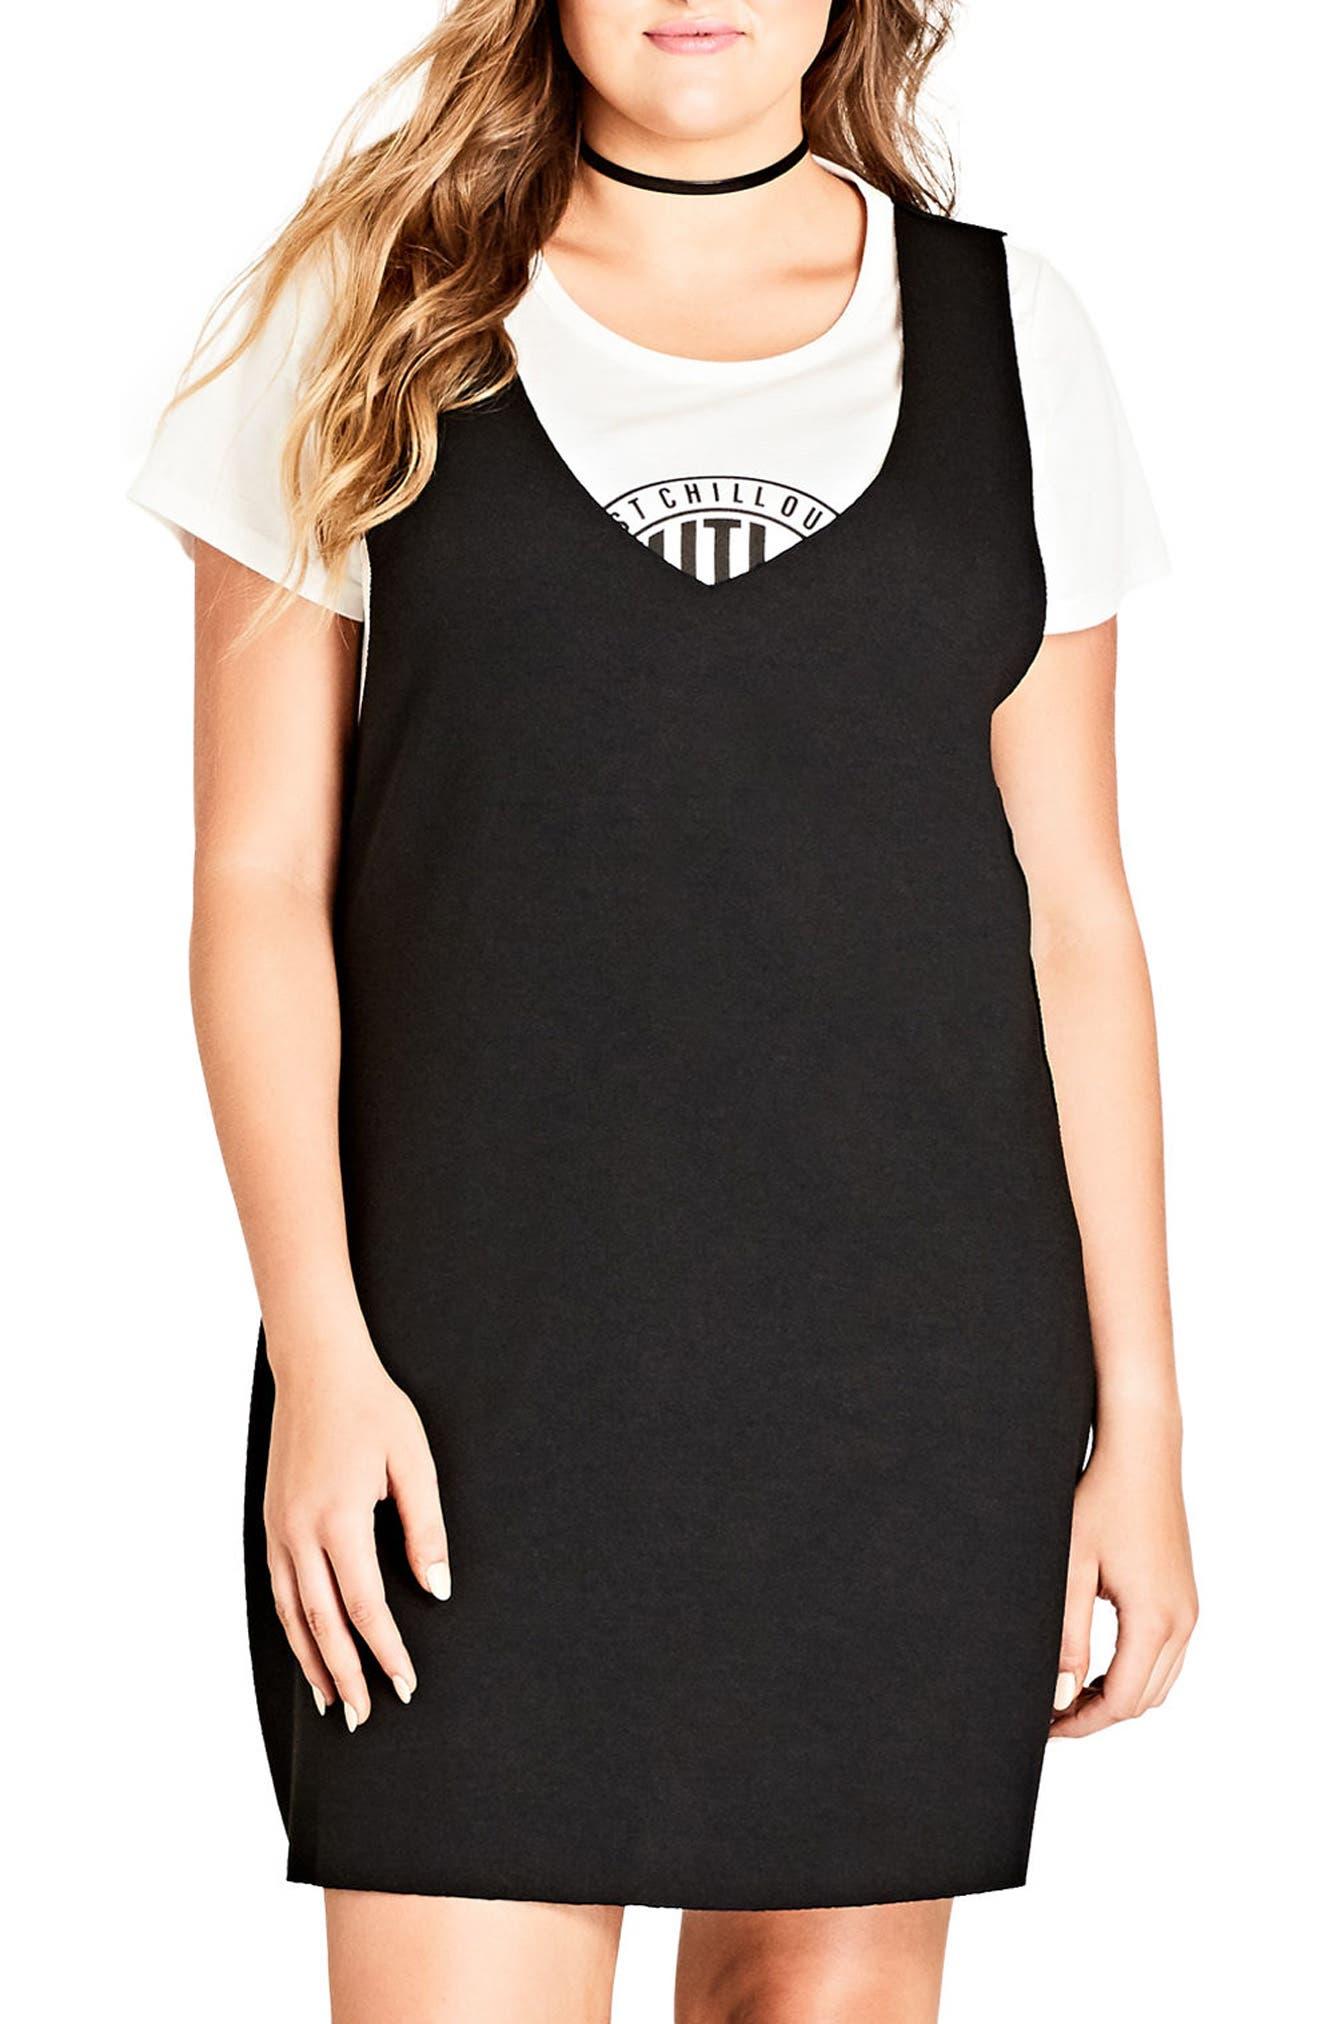 Main Image - City Chic Grunge Girl Dress (Plus Size)